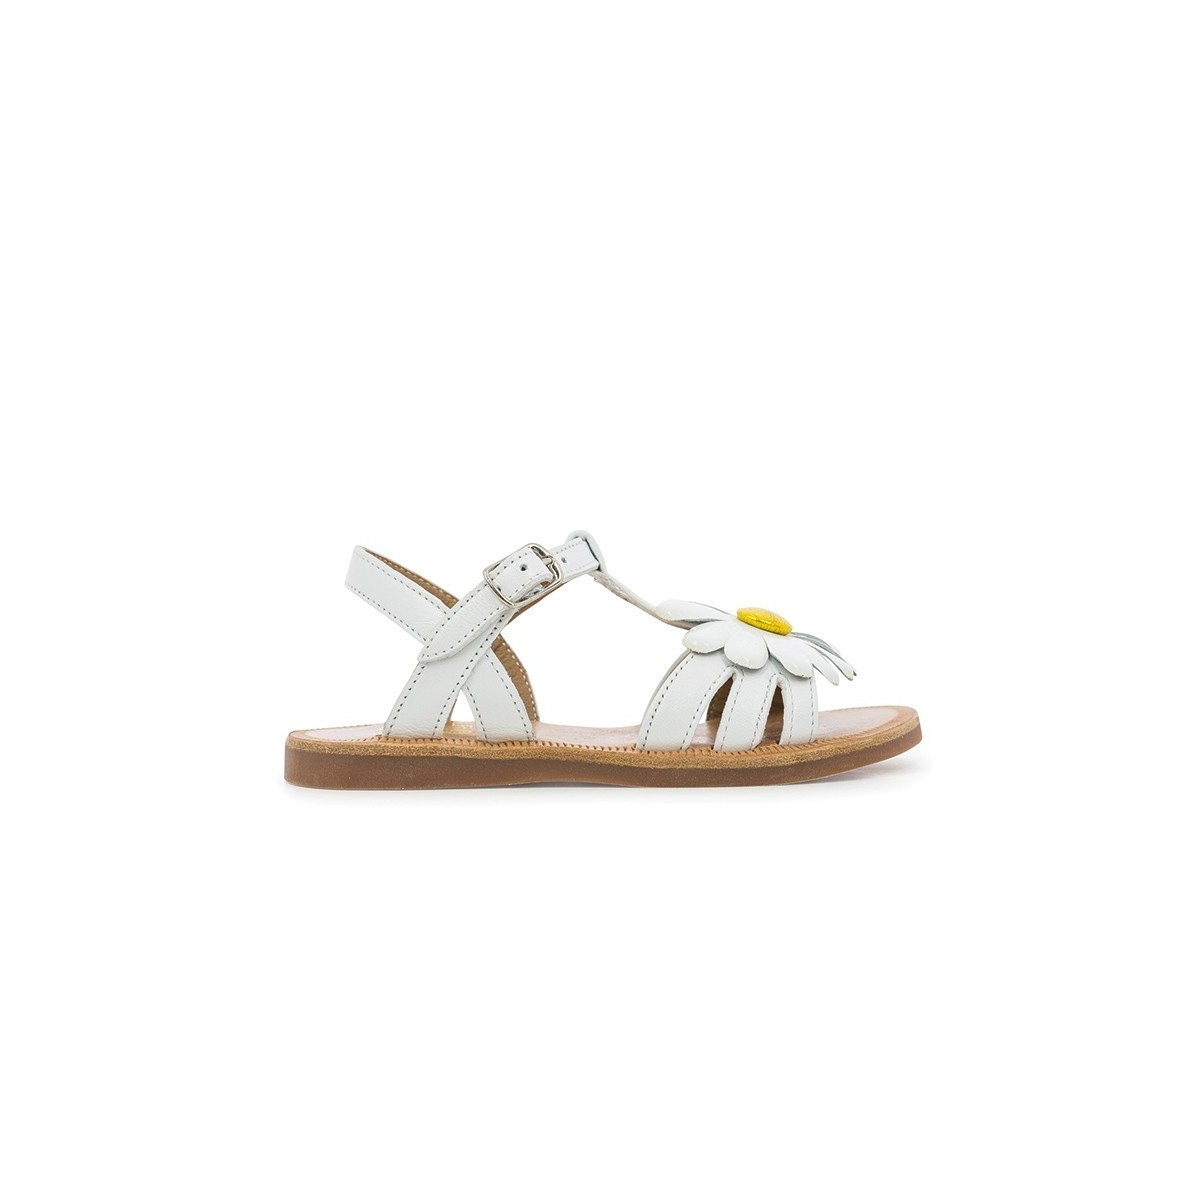 Sandale Plagette Big Flower Blanc/Jaune